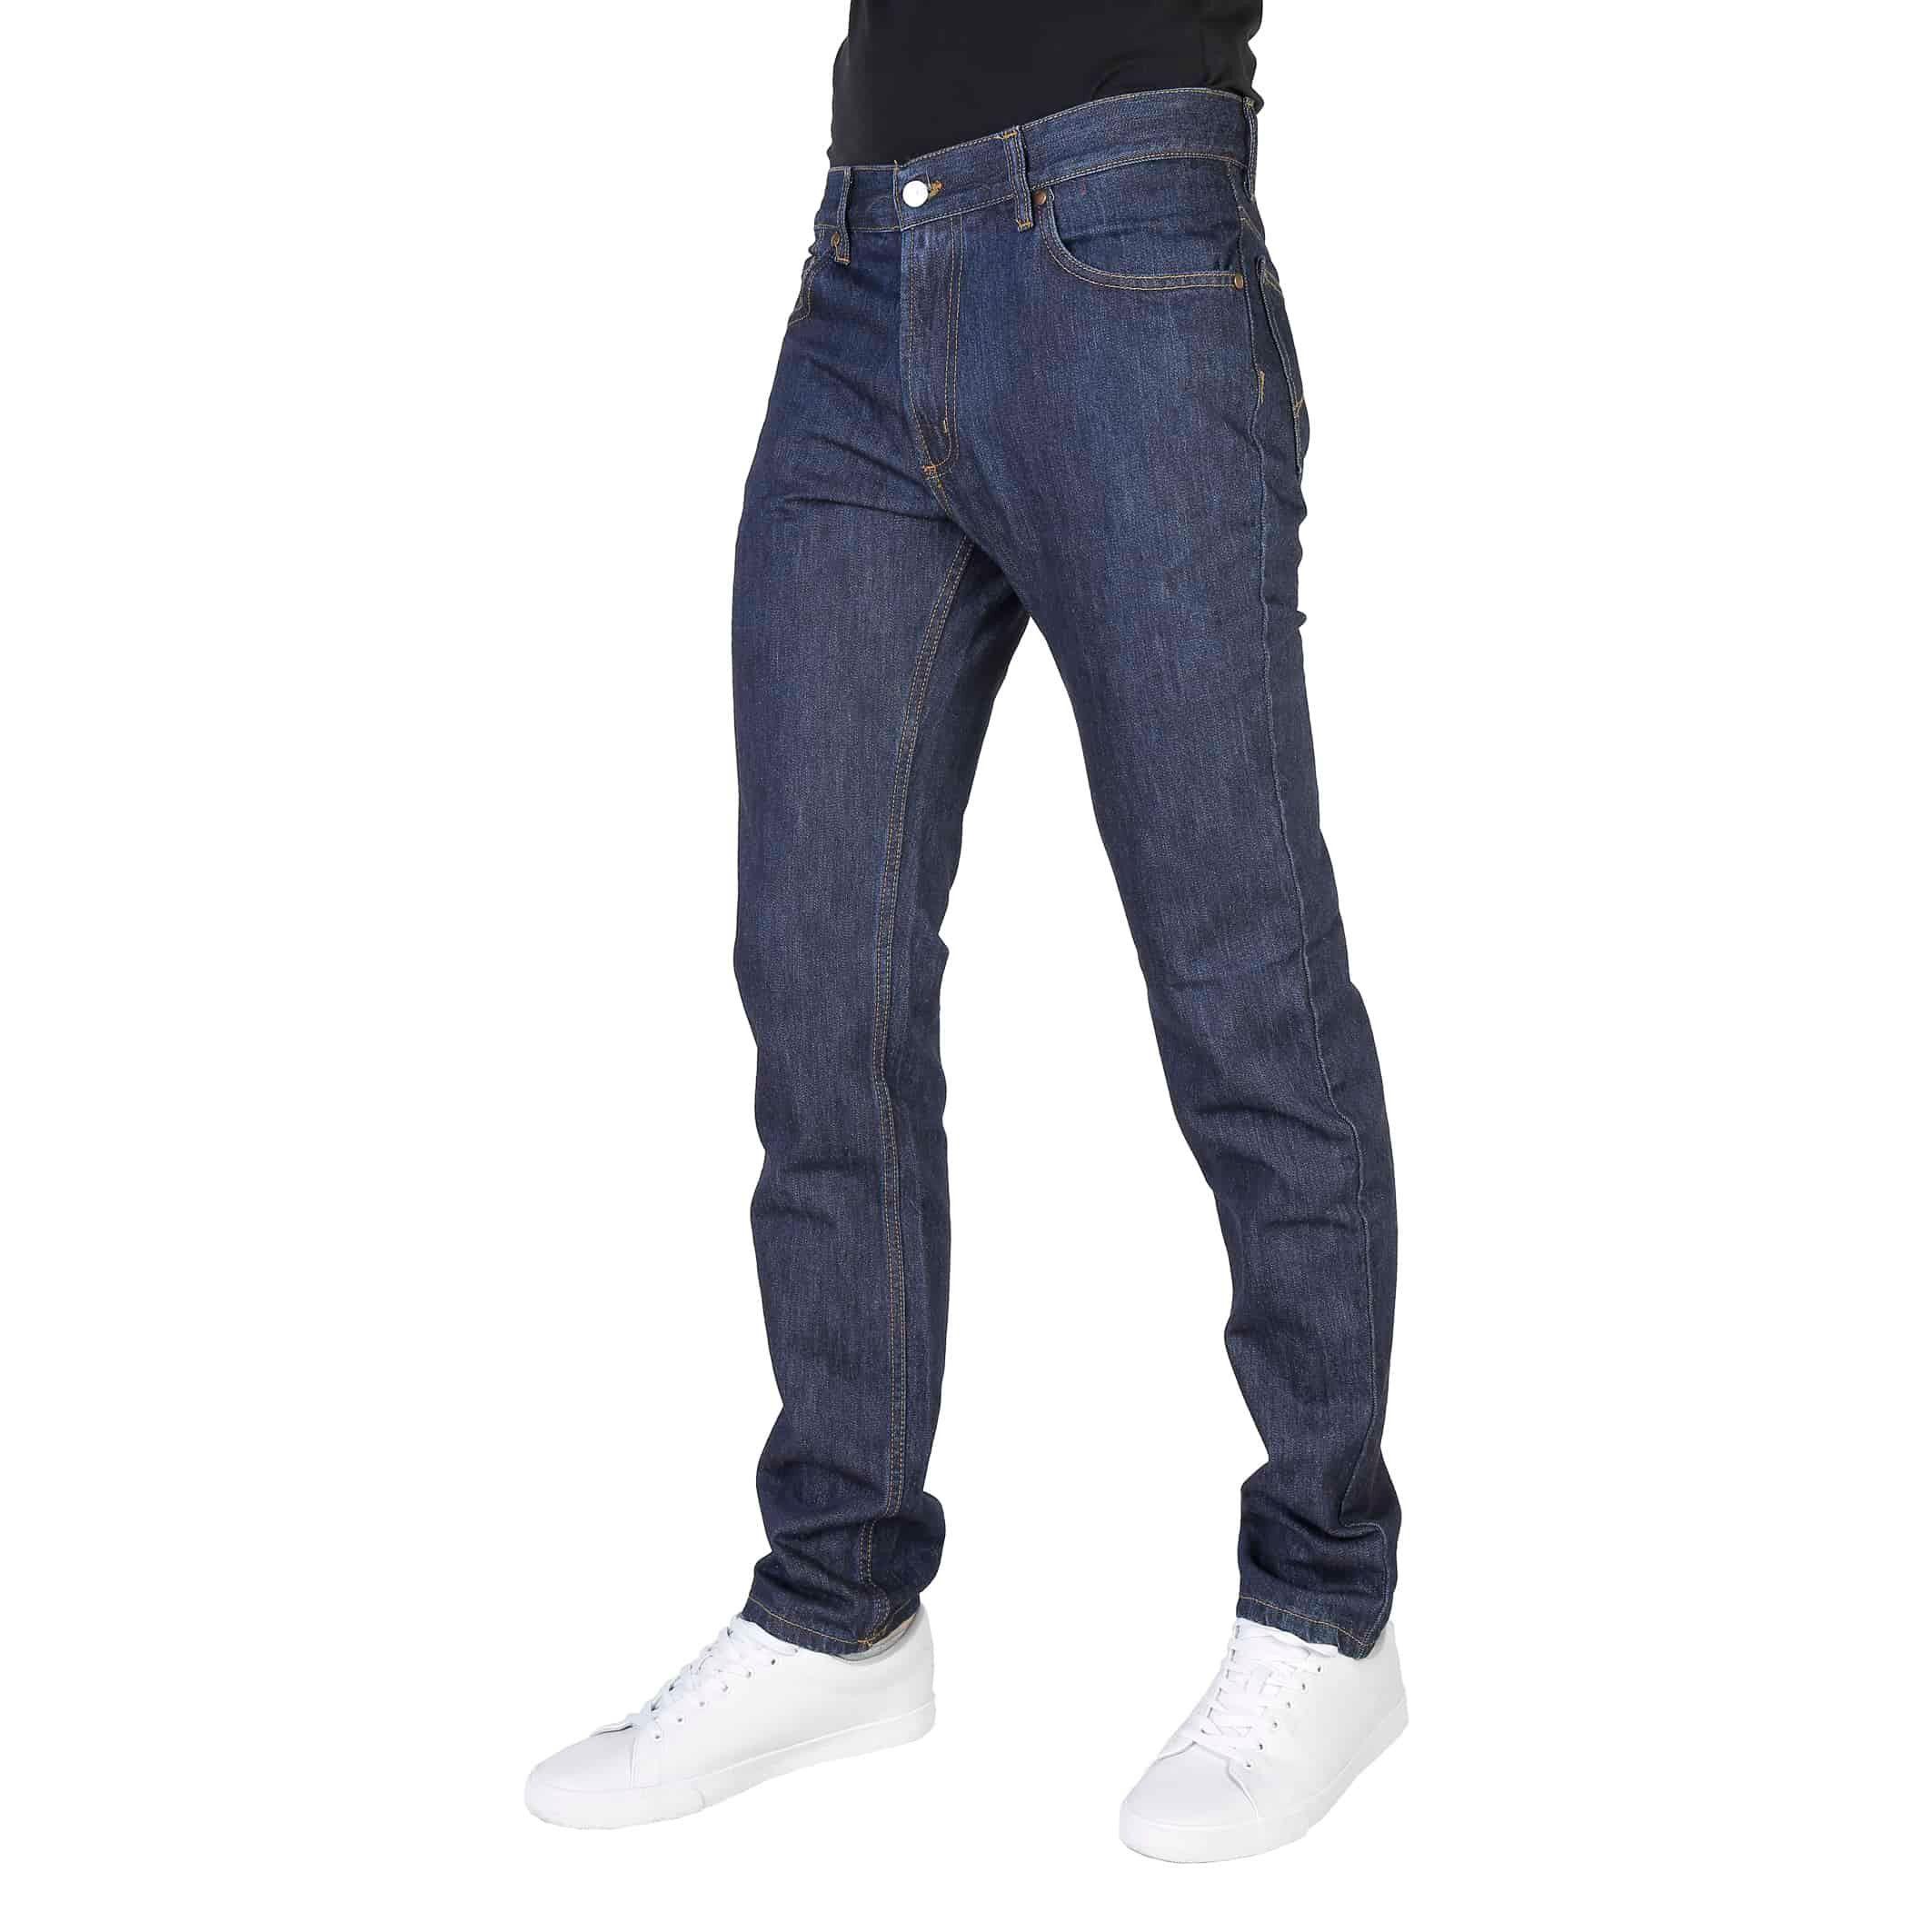 Carrera Jeans – 000700_01021